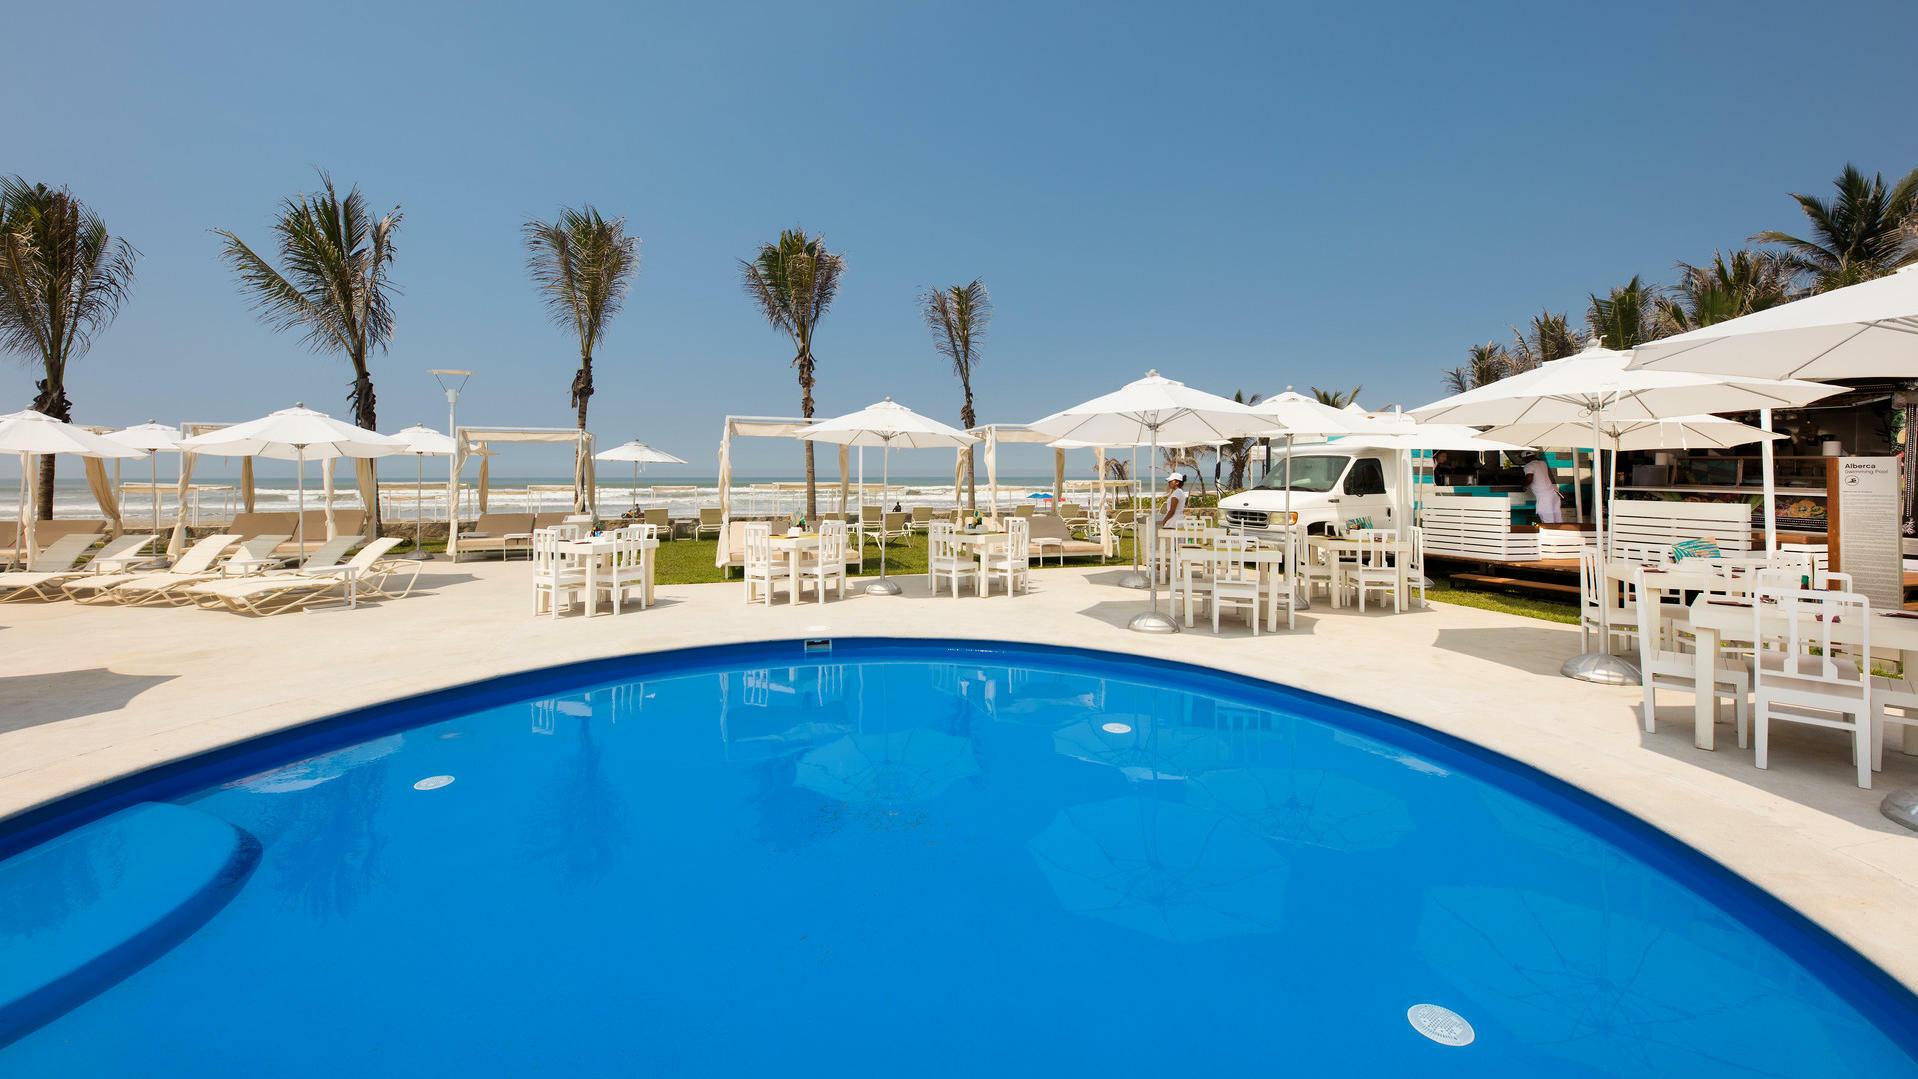 Dining area at Scala Ocean Club in Mundo Imperial